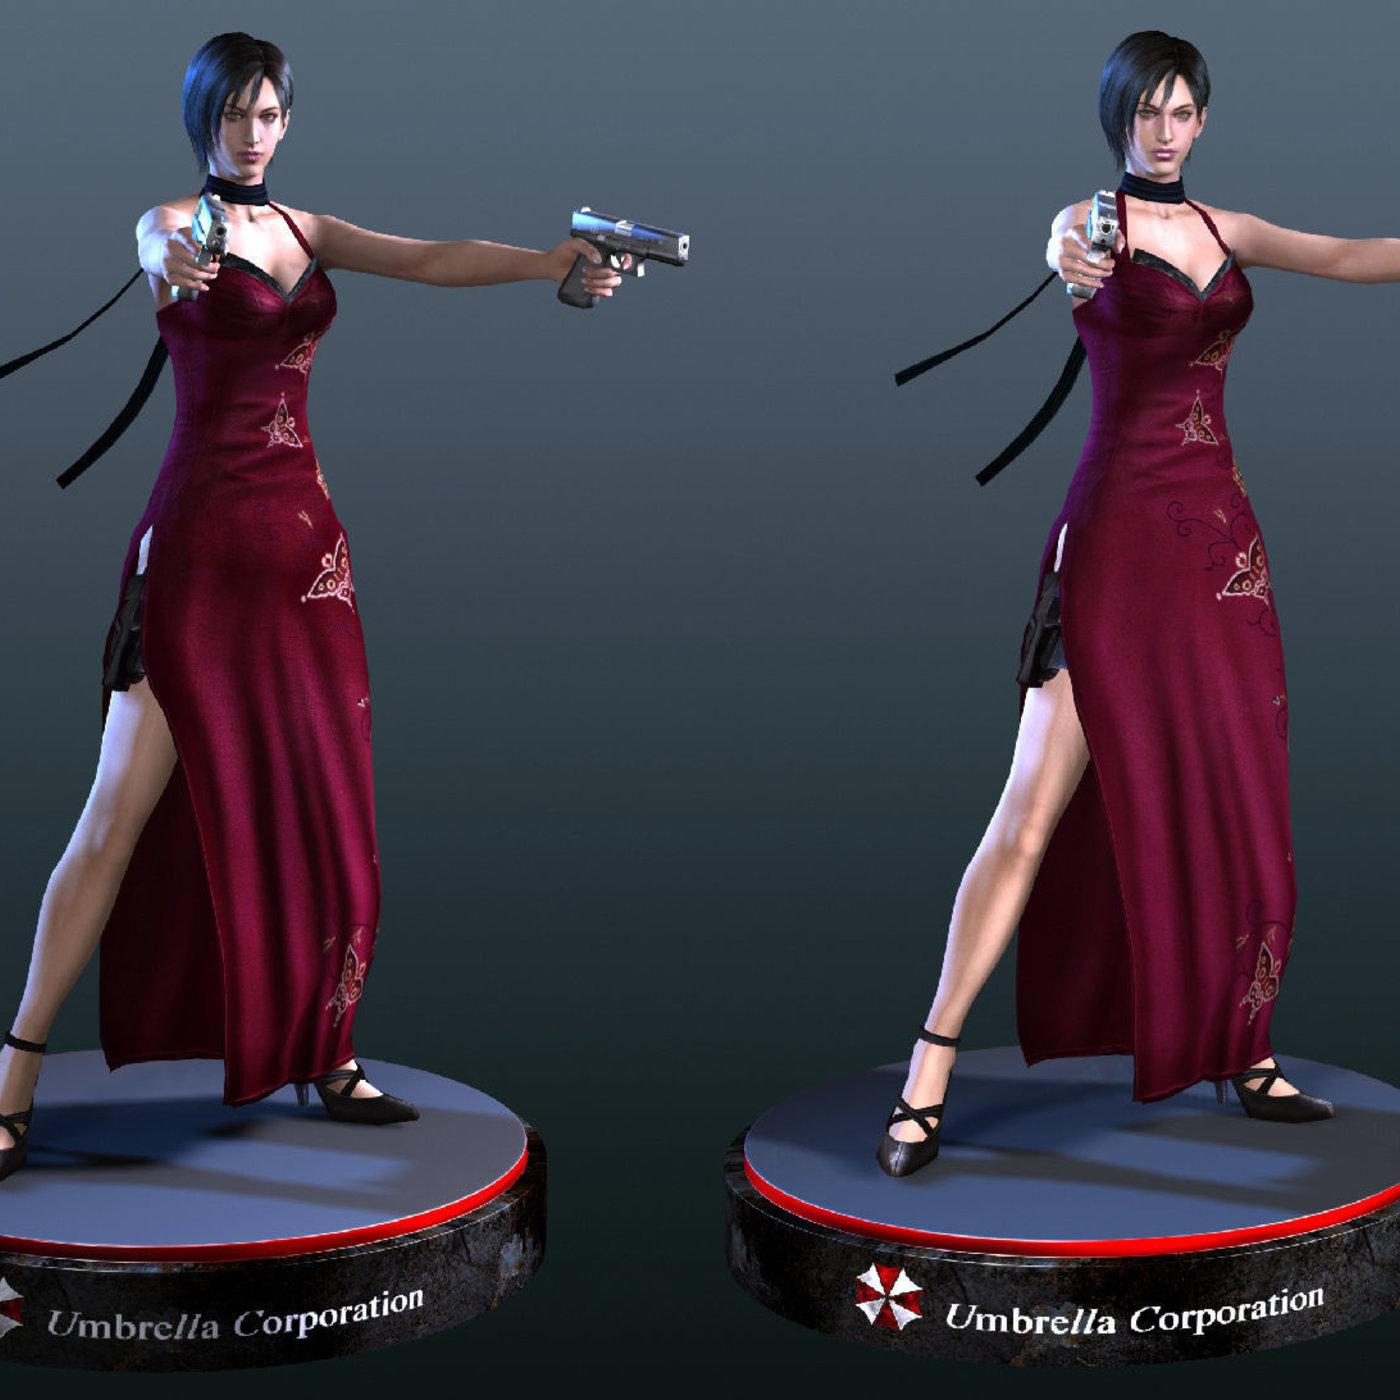 Ada Wong Resident Evil Mods - Gta5 Players - 9GtaMods.com